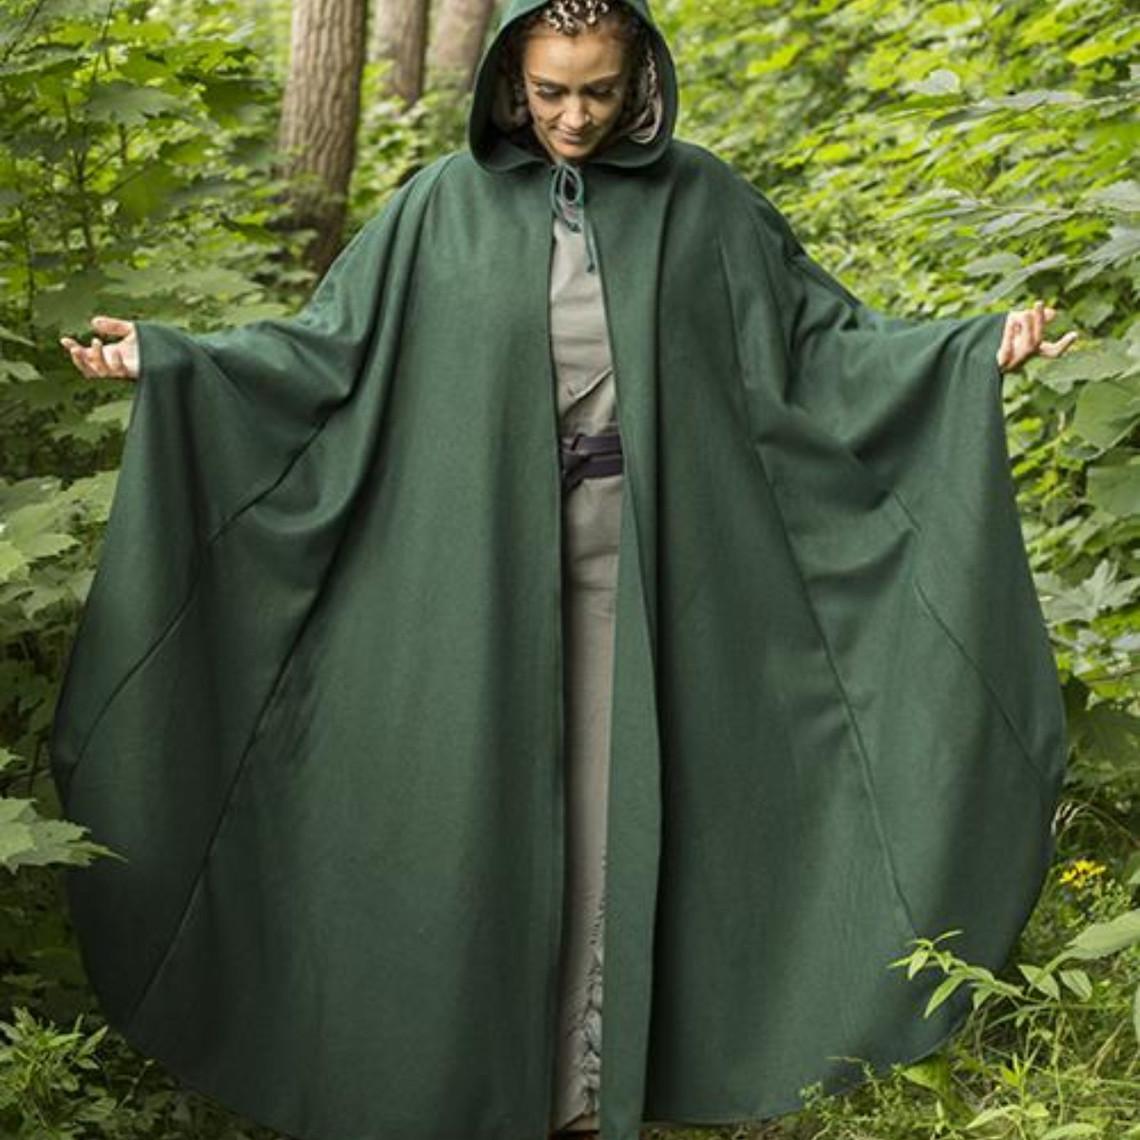 Epic Armoury Viajeros de lana capa verde